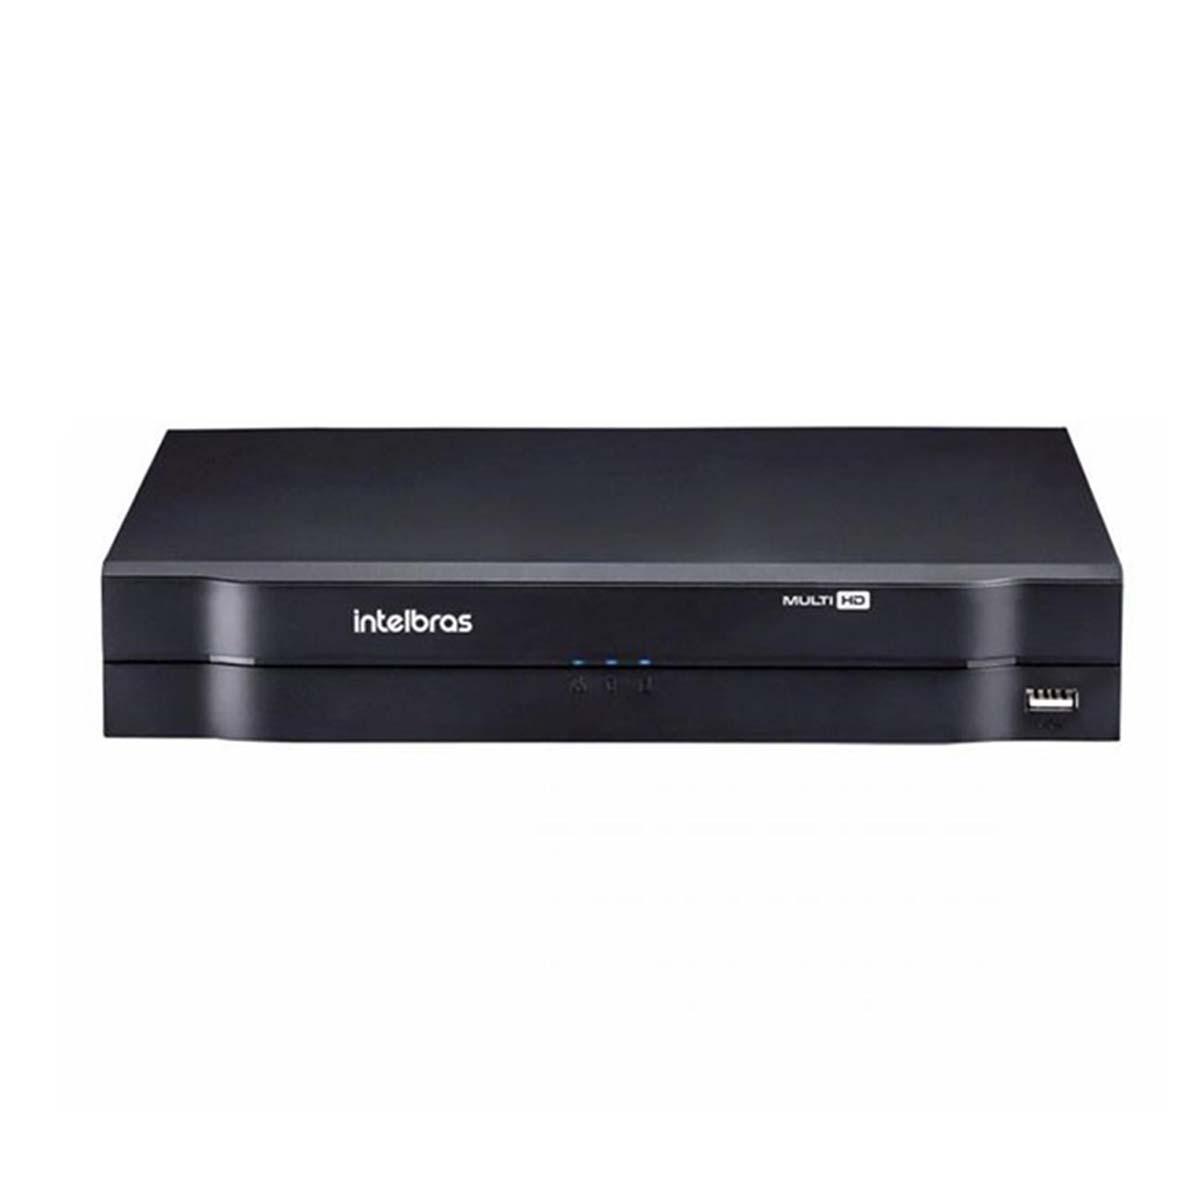 Kit CFTV 04 Câmeras VHD 1220 Black G6 + MHDX 1104 S/ HD + Acessórios